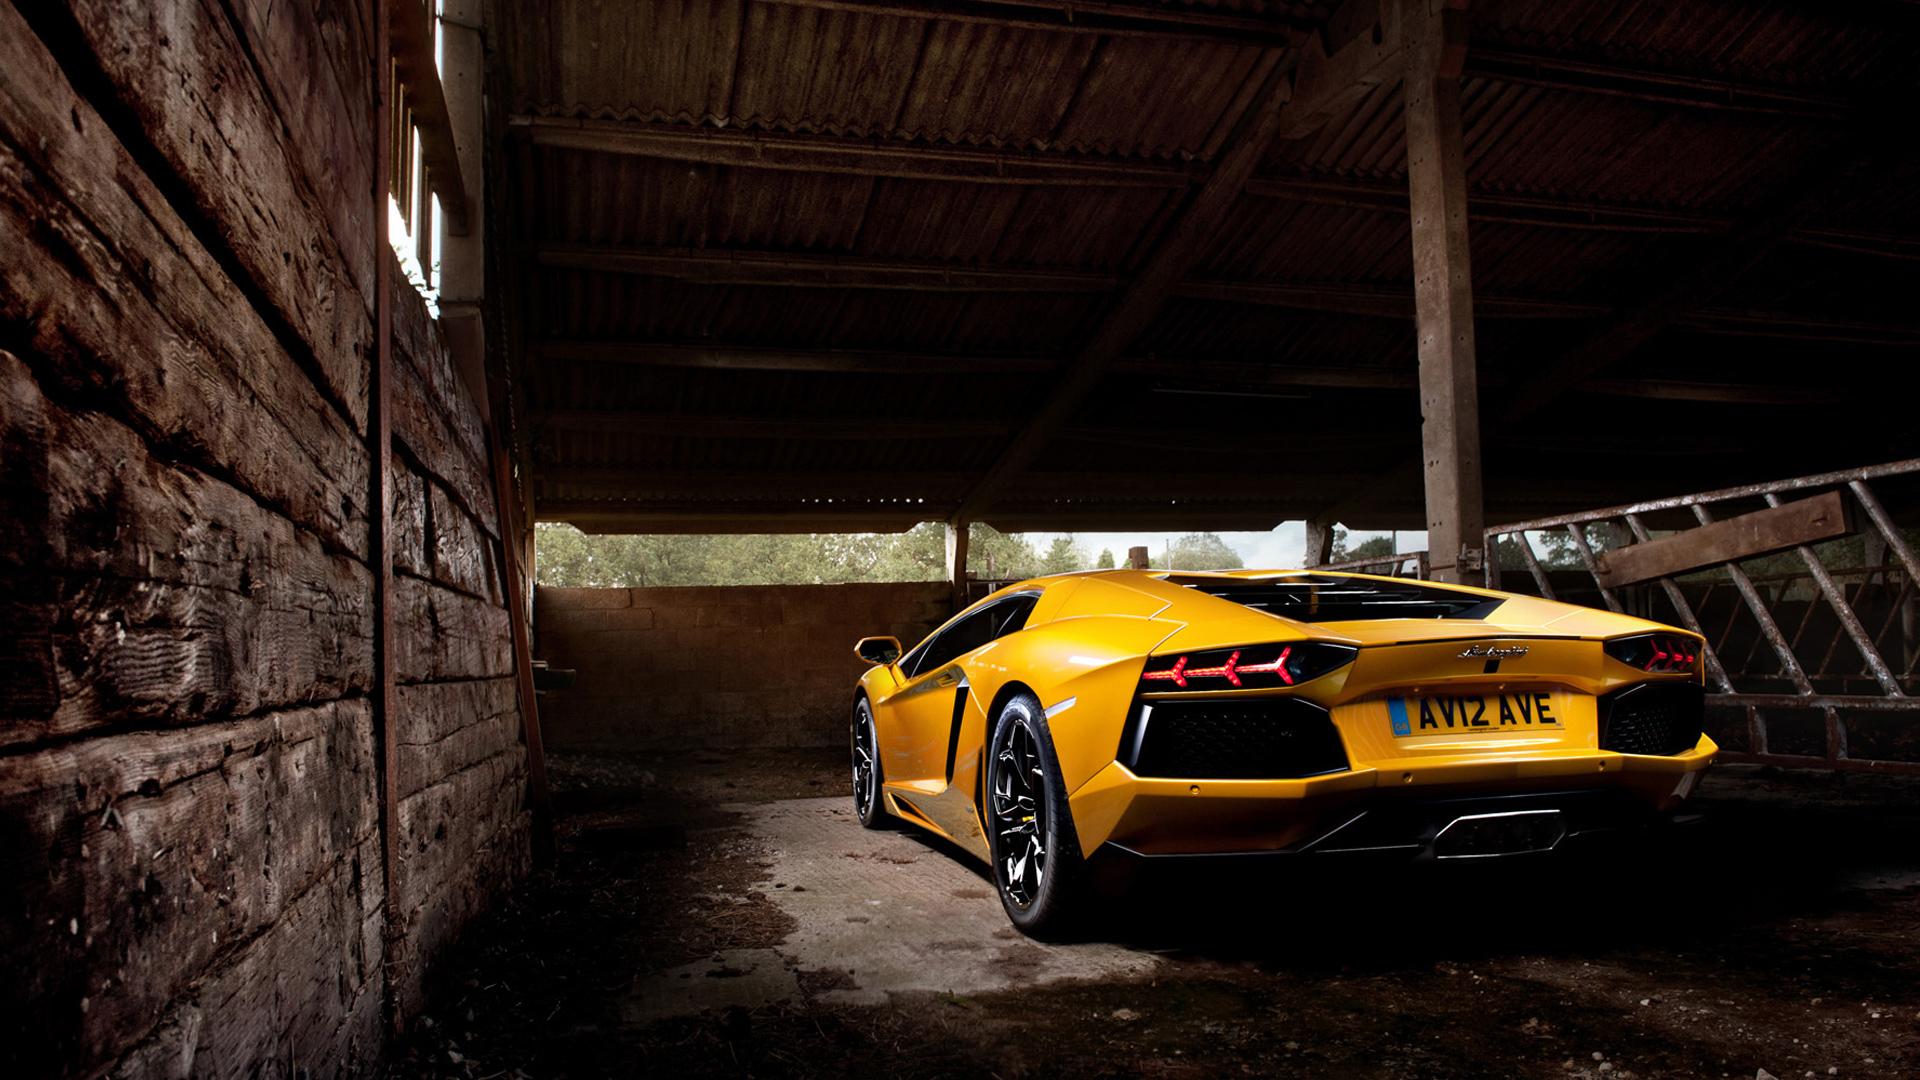 Yellow Lamborghini Aventador 2 Wallpaper Hd Car Wallpapers Id